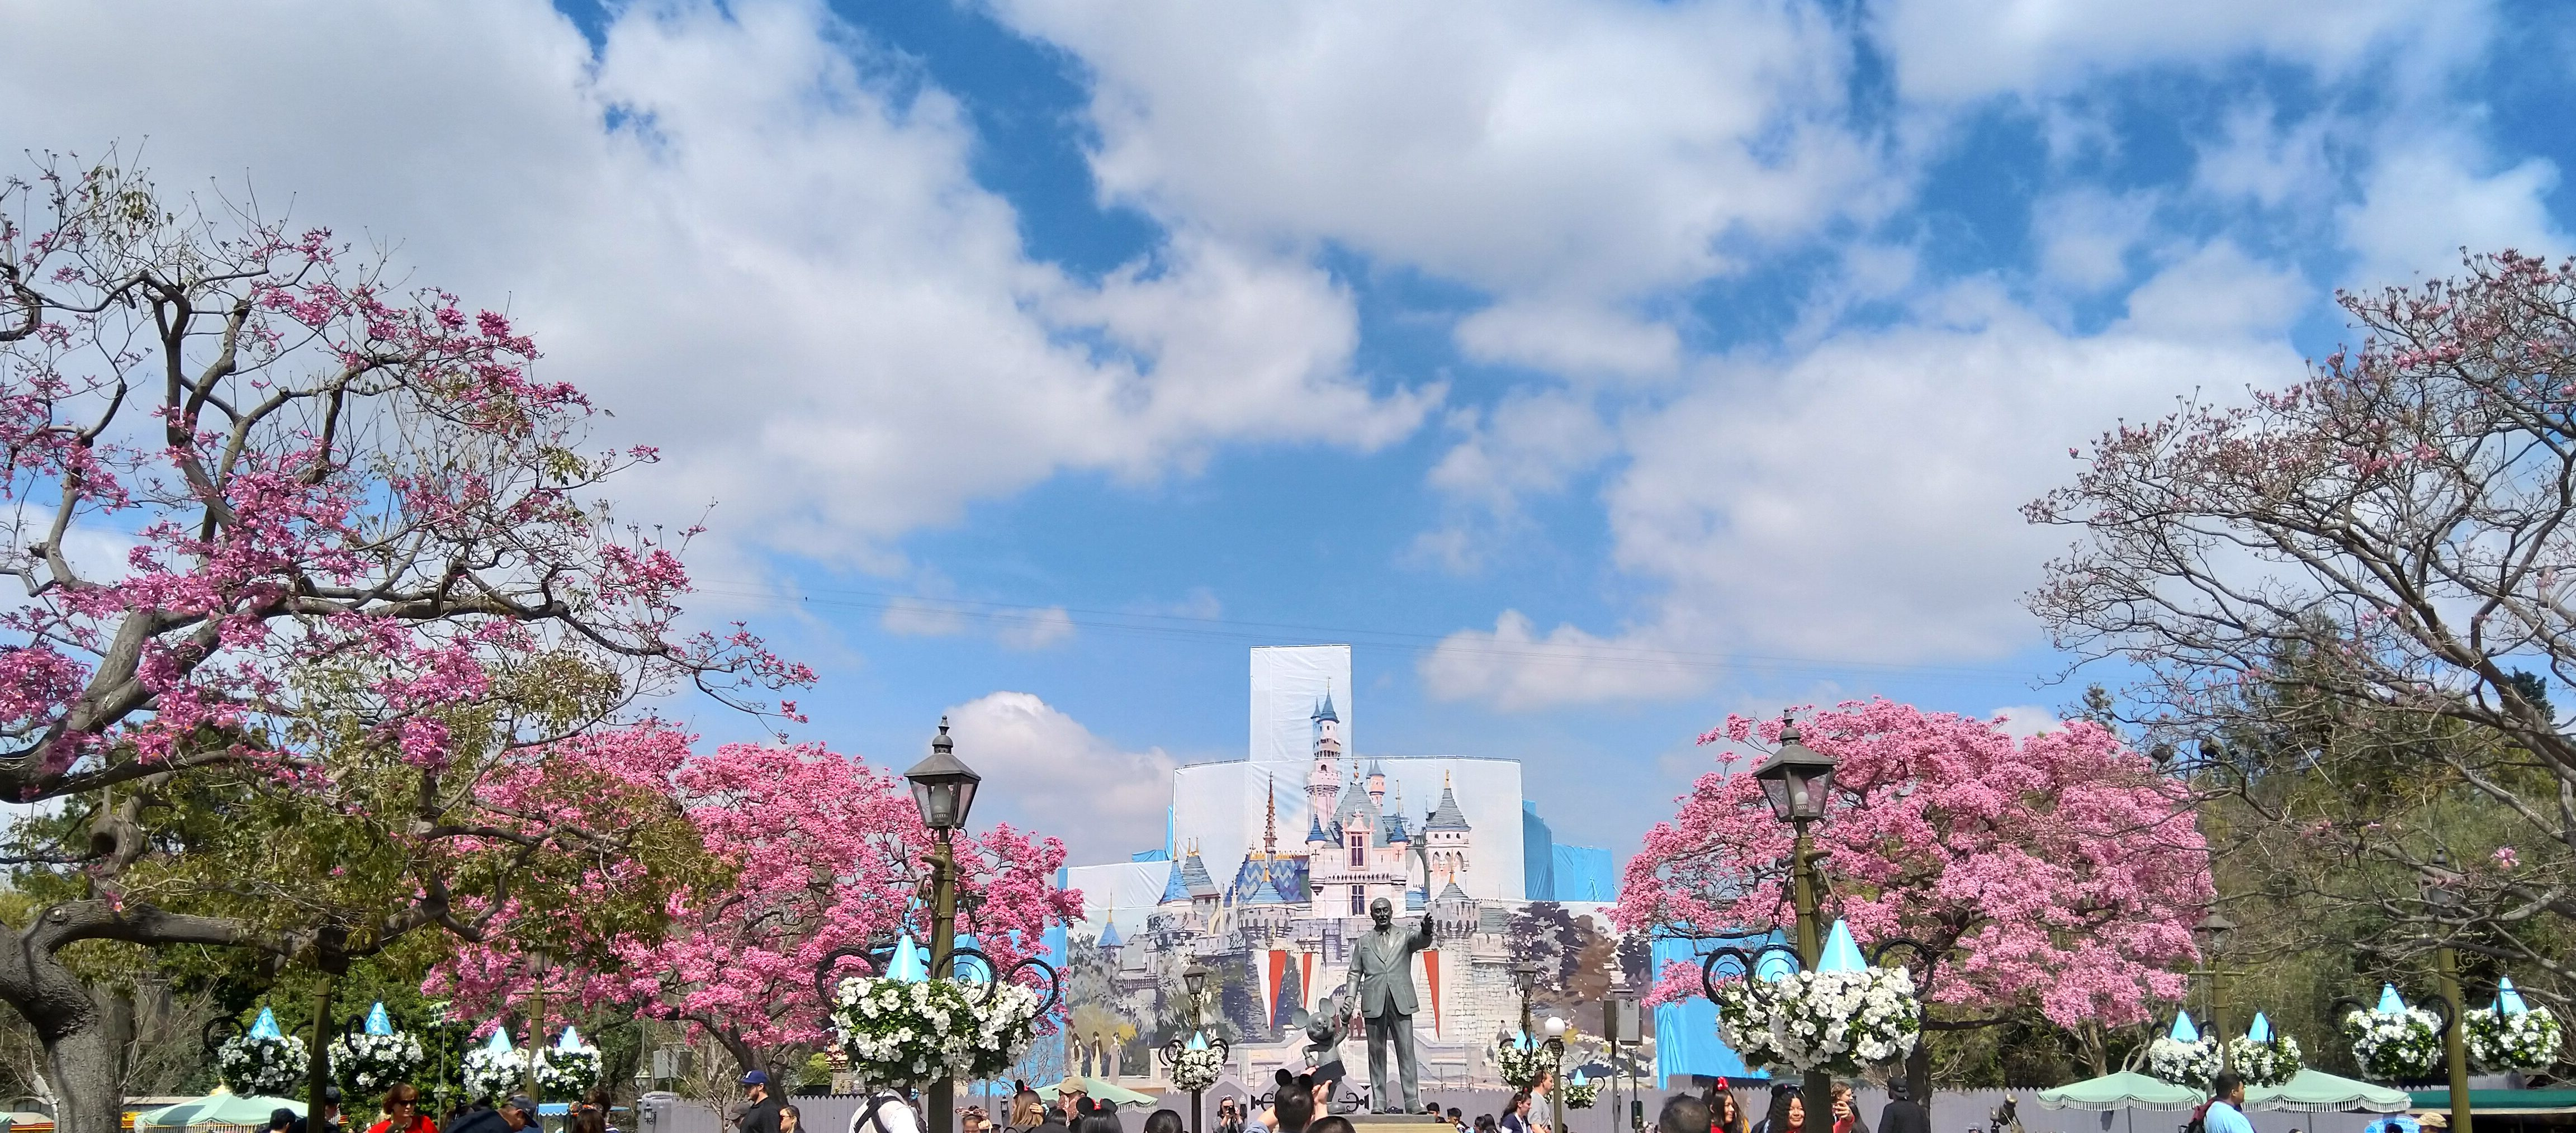 Disneylands 64th Birthday!